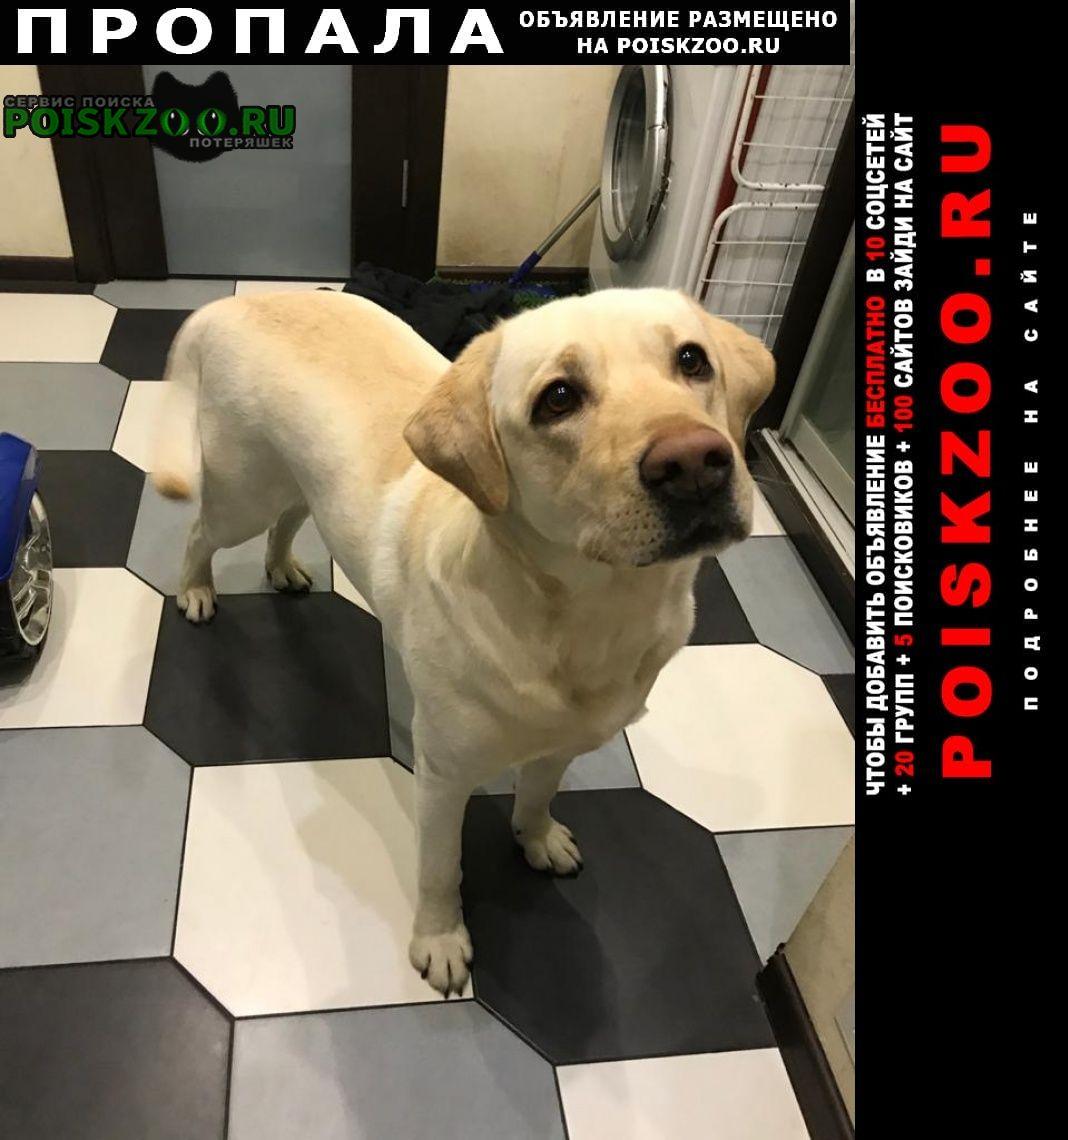 Пропала собака лабрадор Пенза